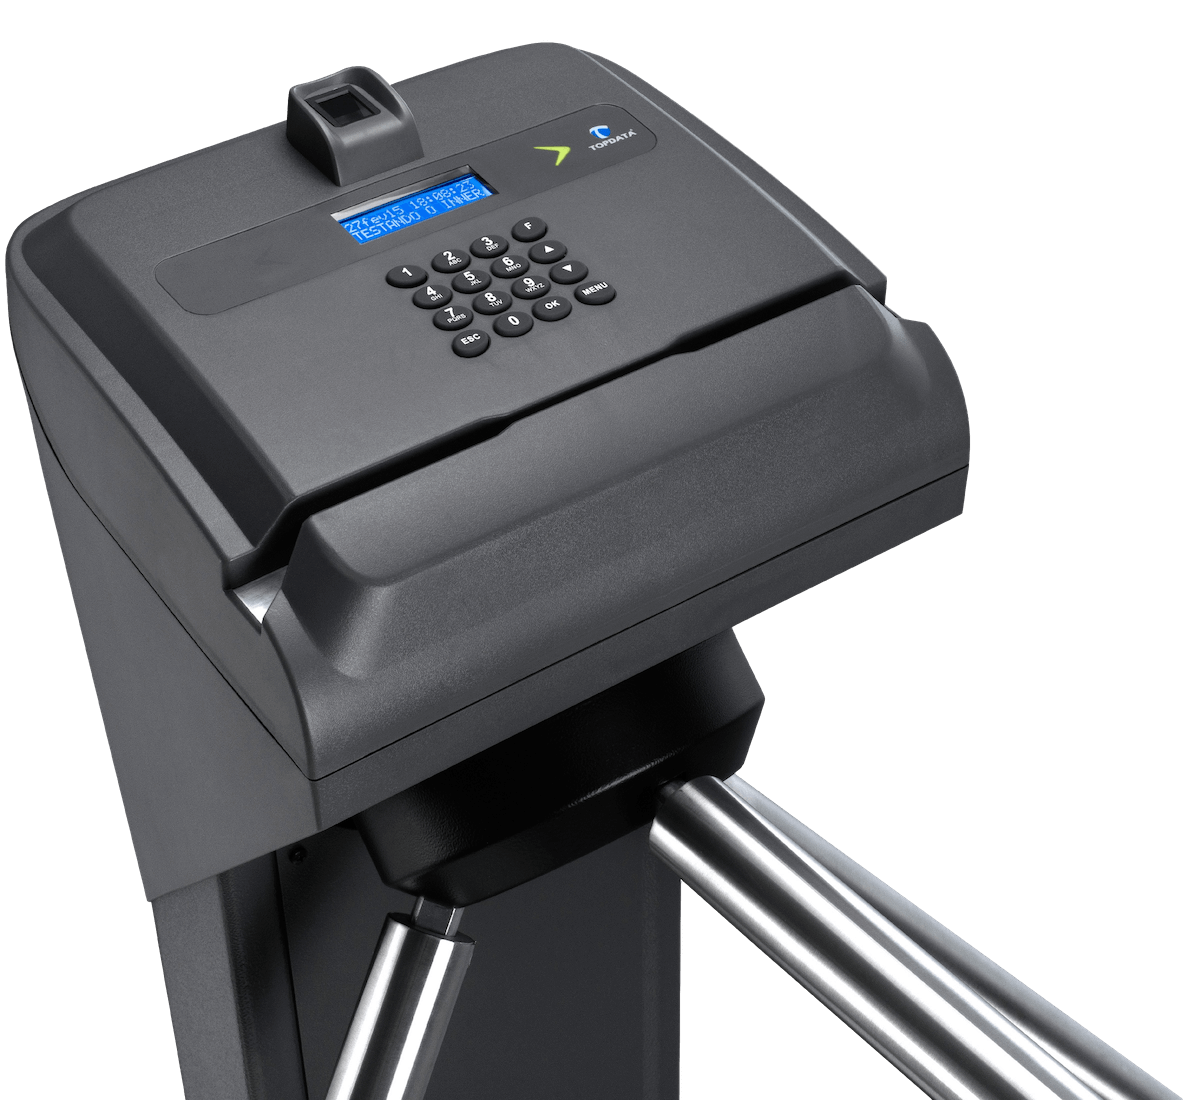 catraca biométrica